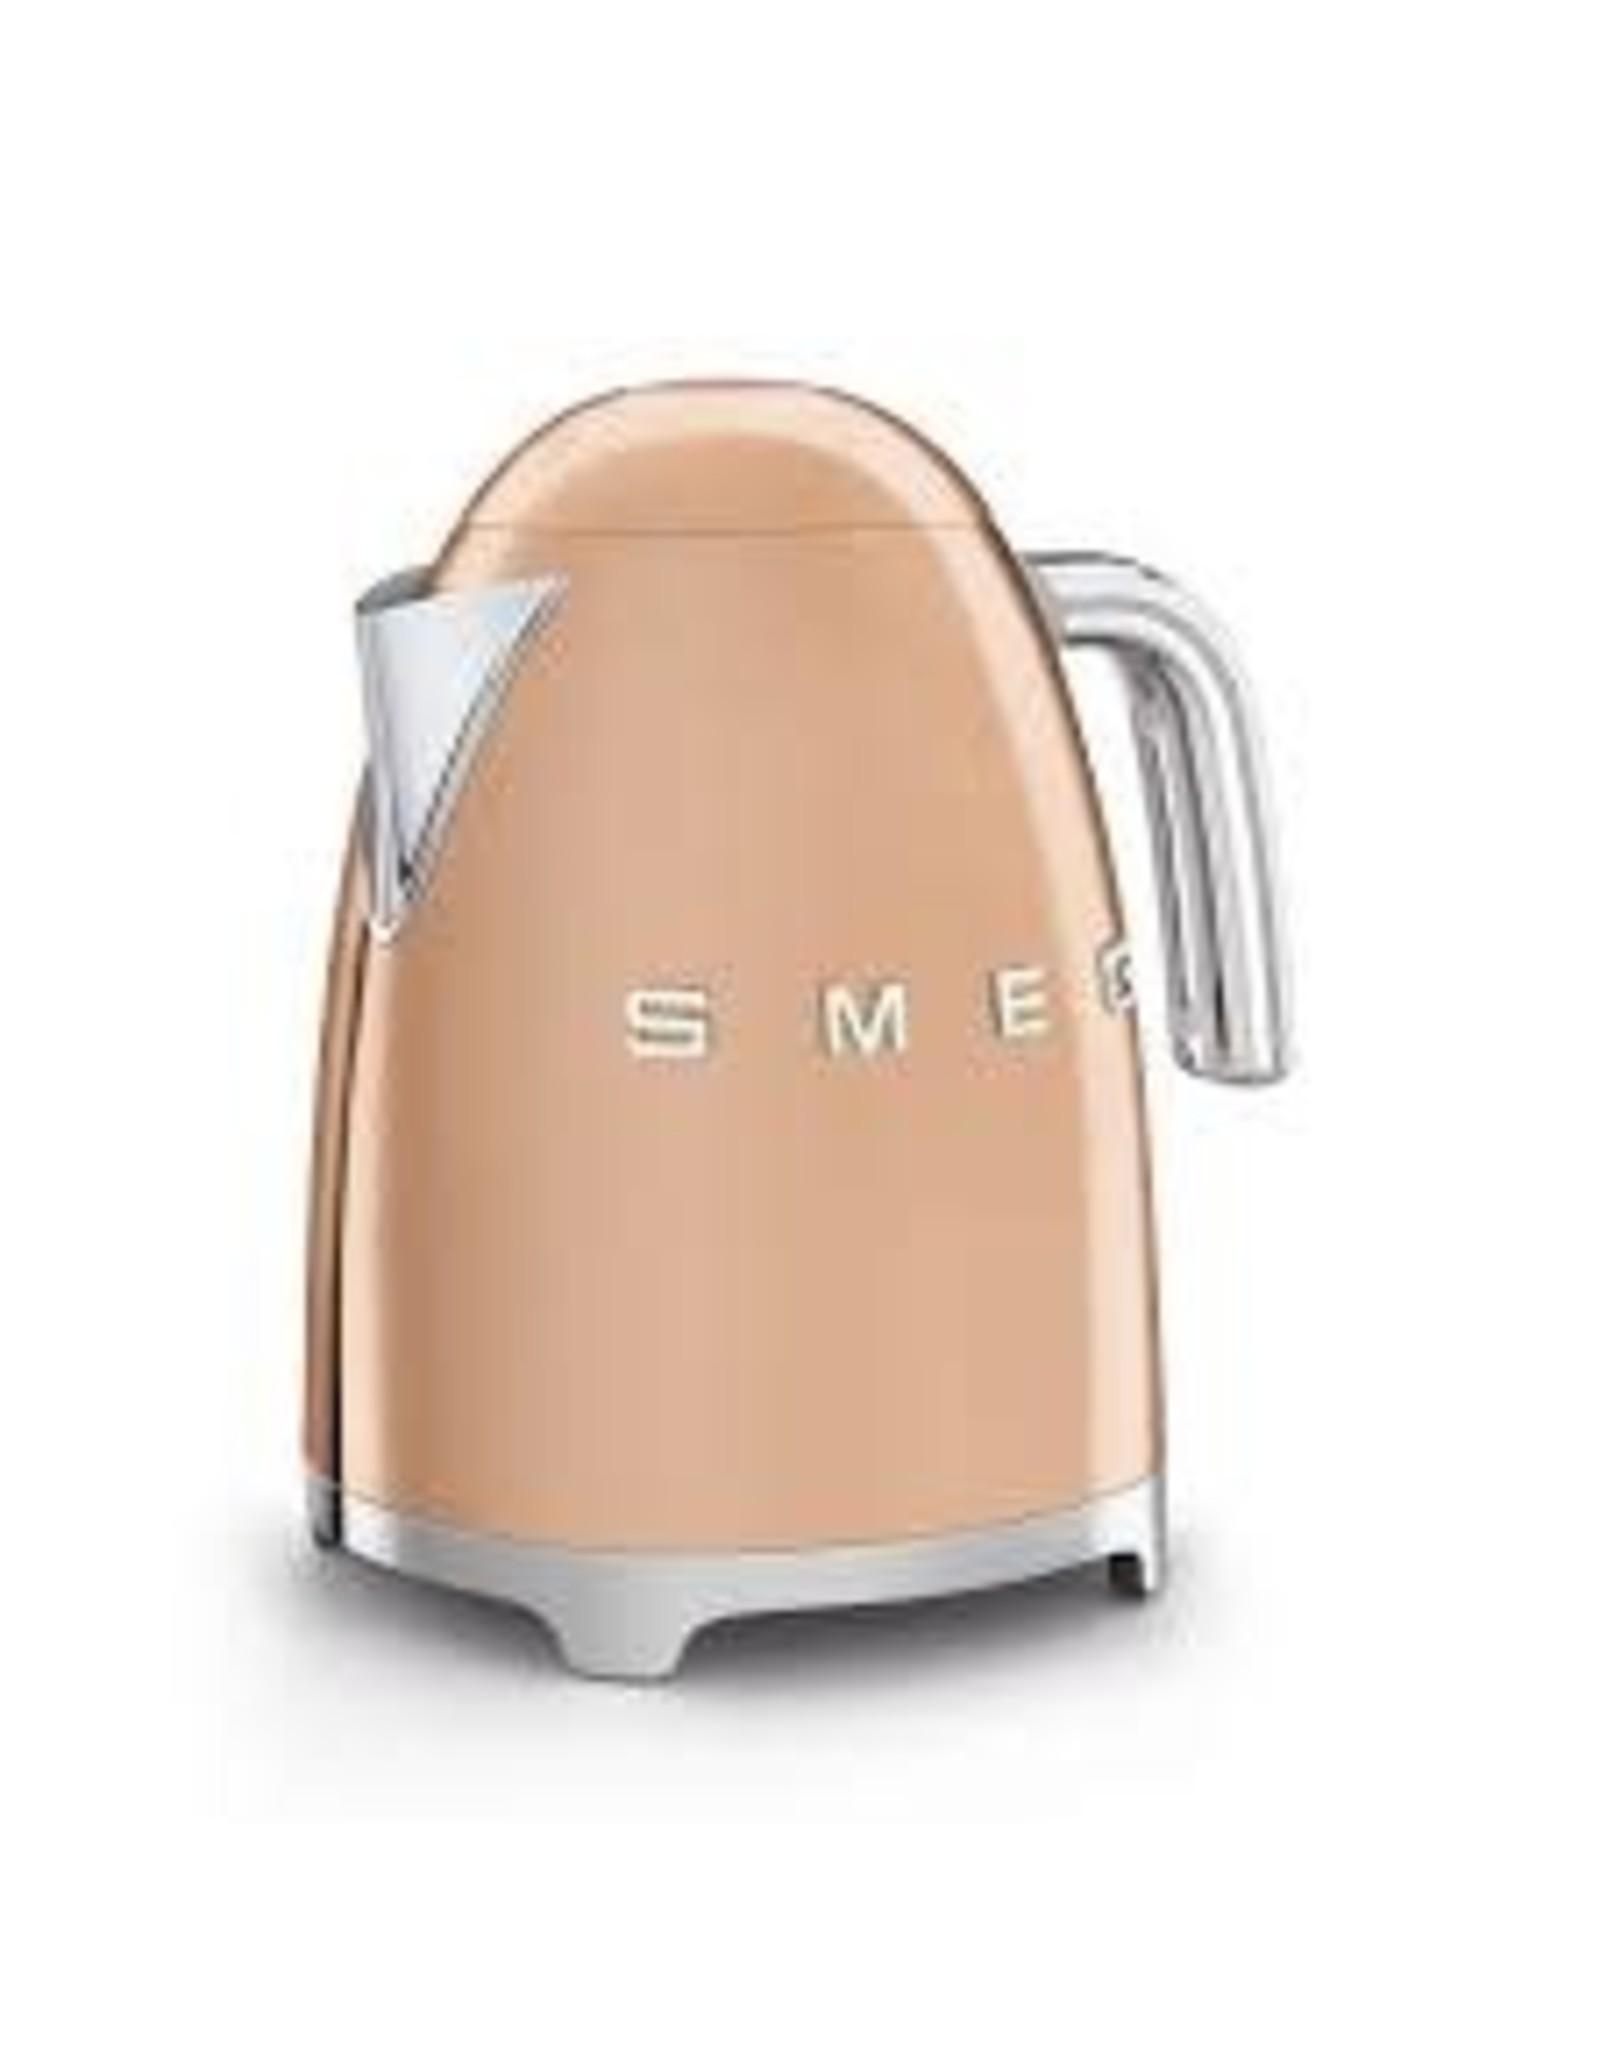 Smeg SMEG Electric Kettle - Rose Gold